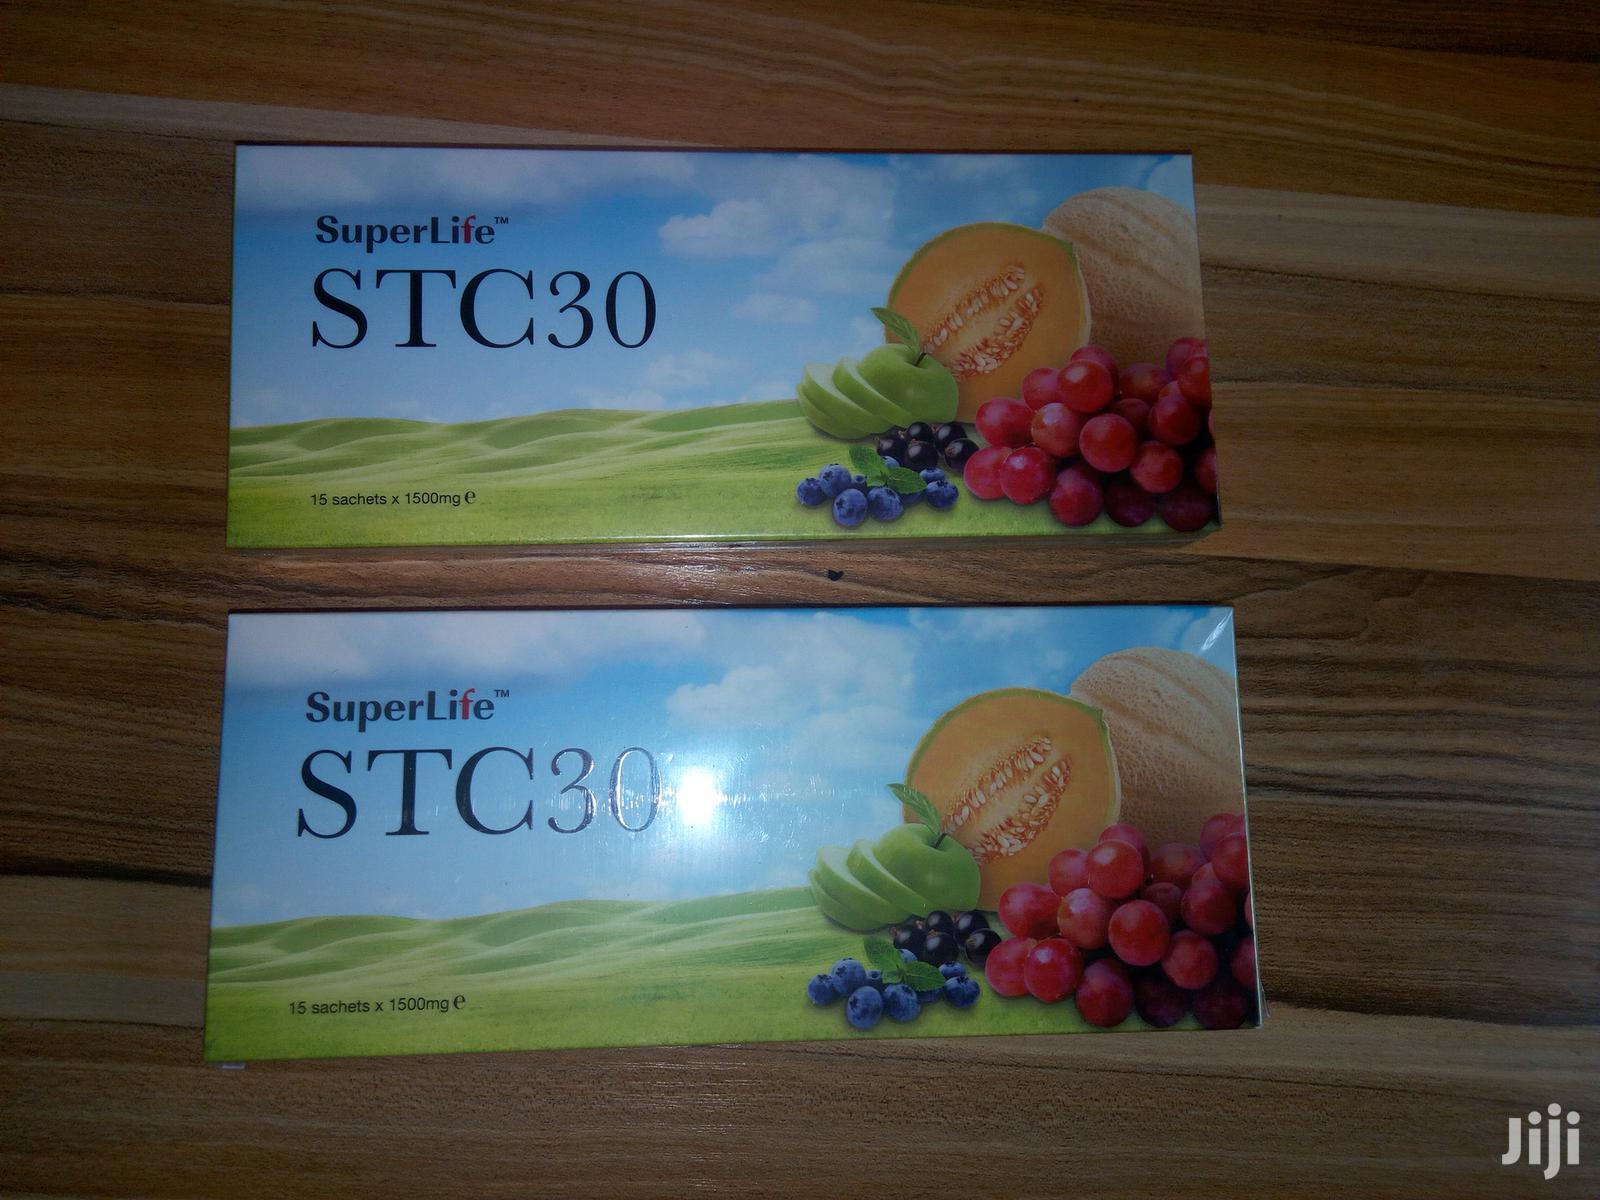 Superlife Stem Cell Stc30